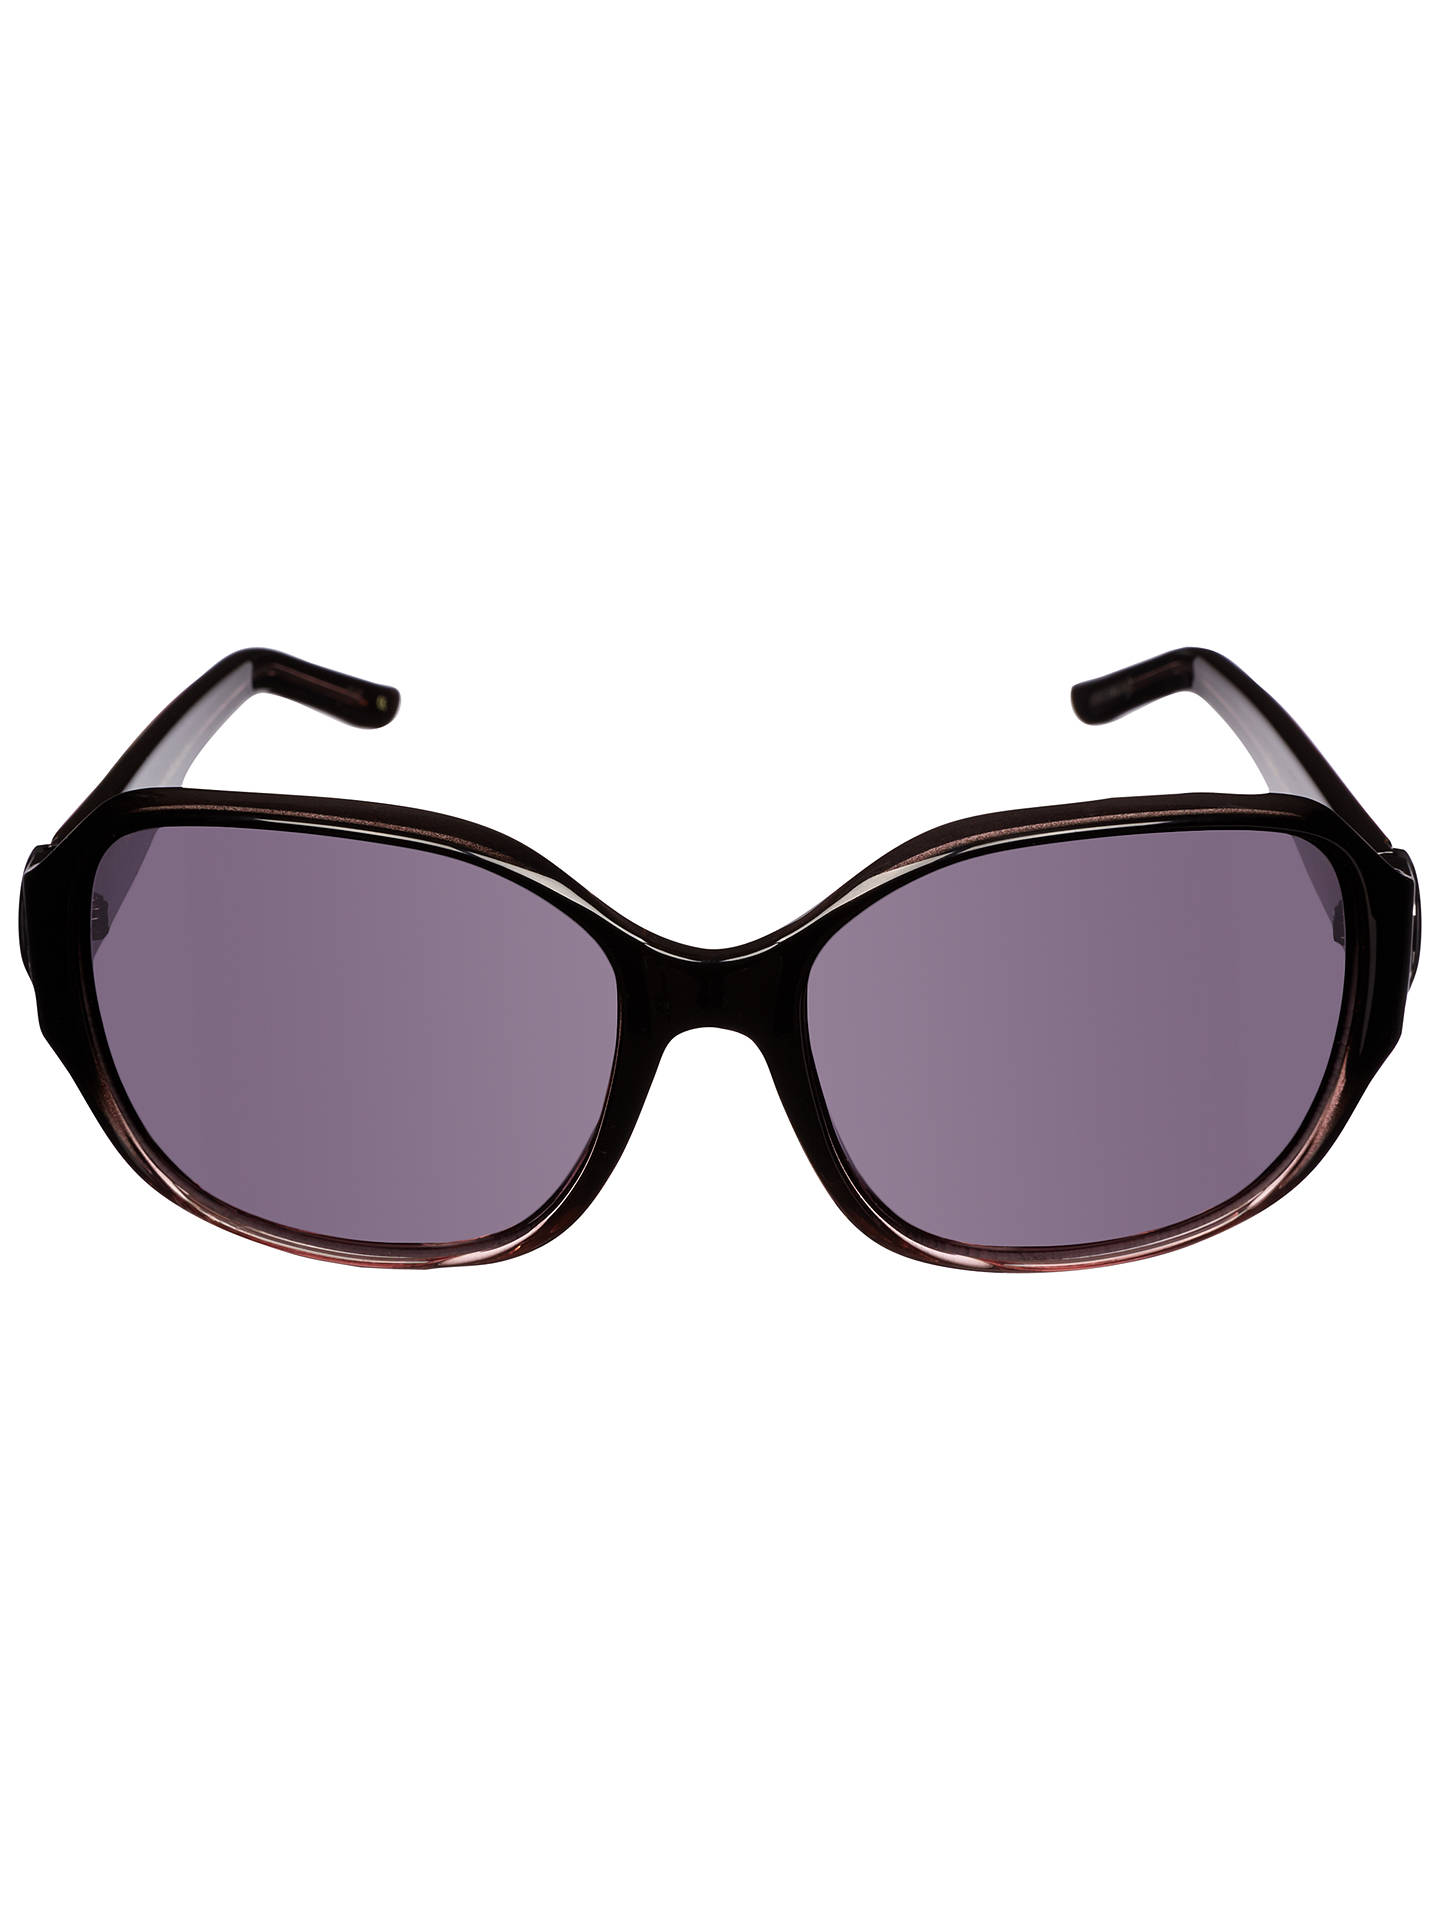 8cec079f7b1cb ... Buy Ted Baker TB1254 Beverly Sunglasses